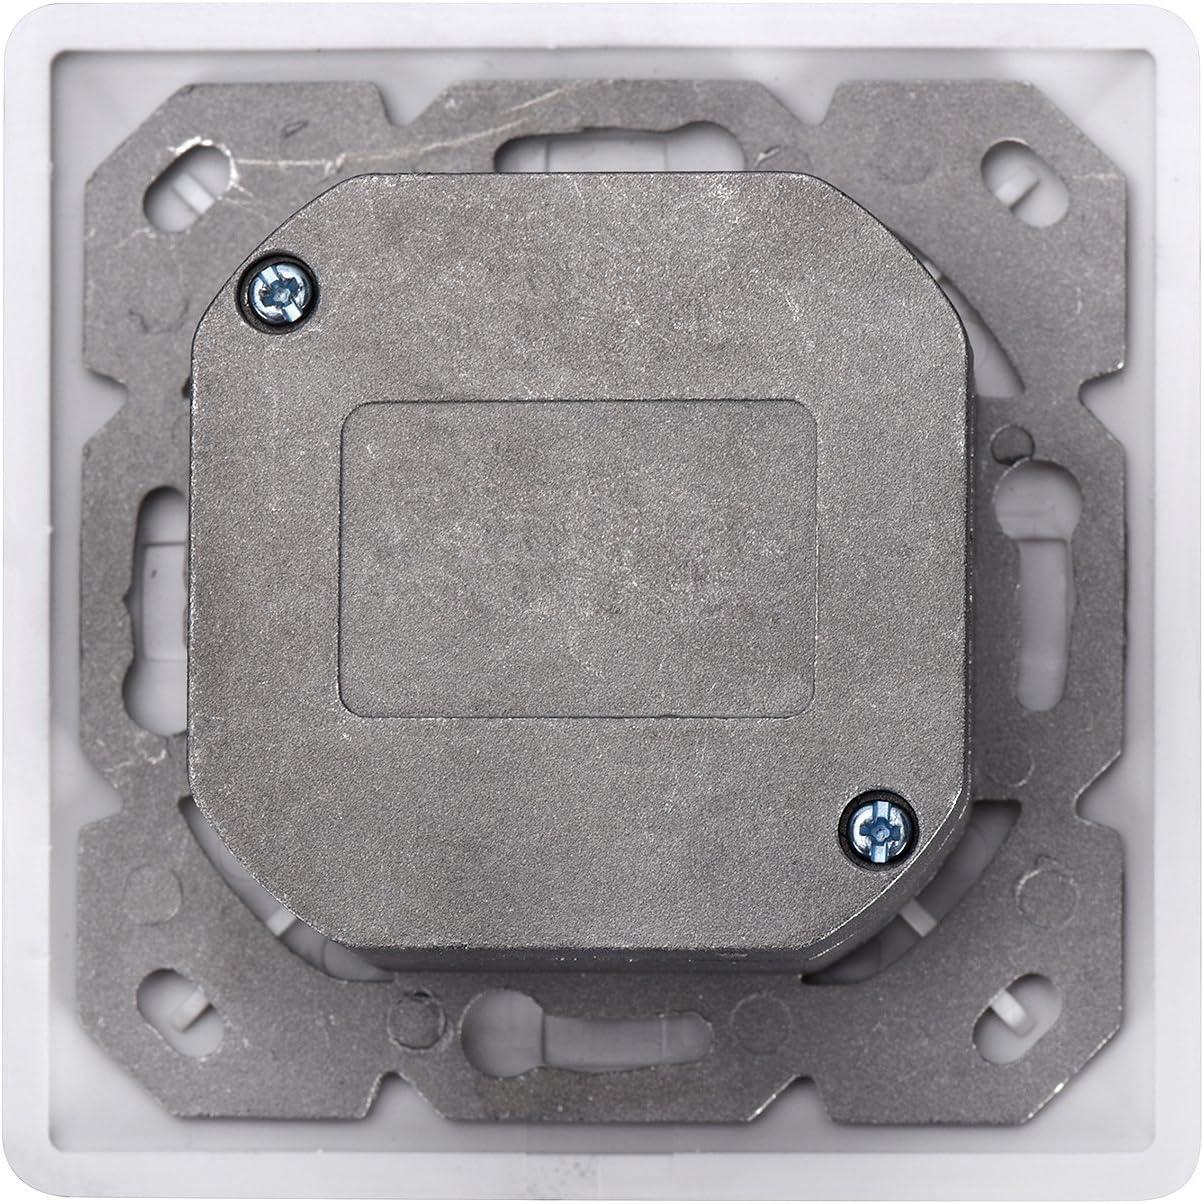 5 unidades Instalaci/ón de cable horizontal Montaje empotrable 1 Gbit DN-9002//B5-N Toma de pared red Cat 5e DIGITUS Professional